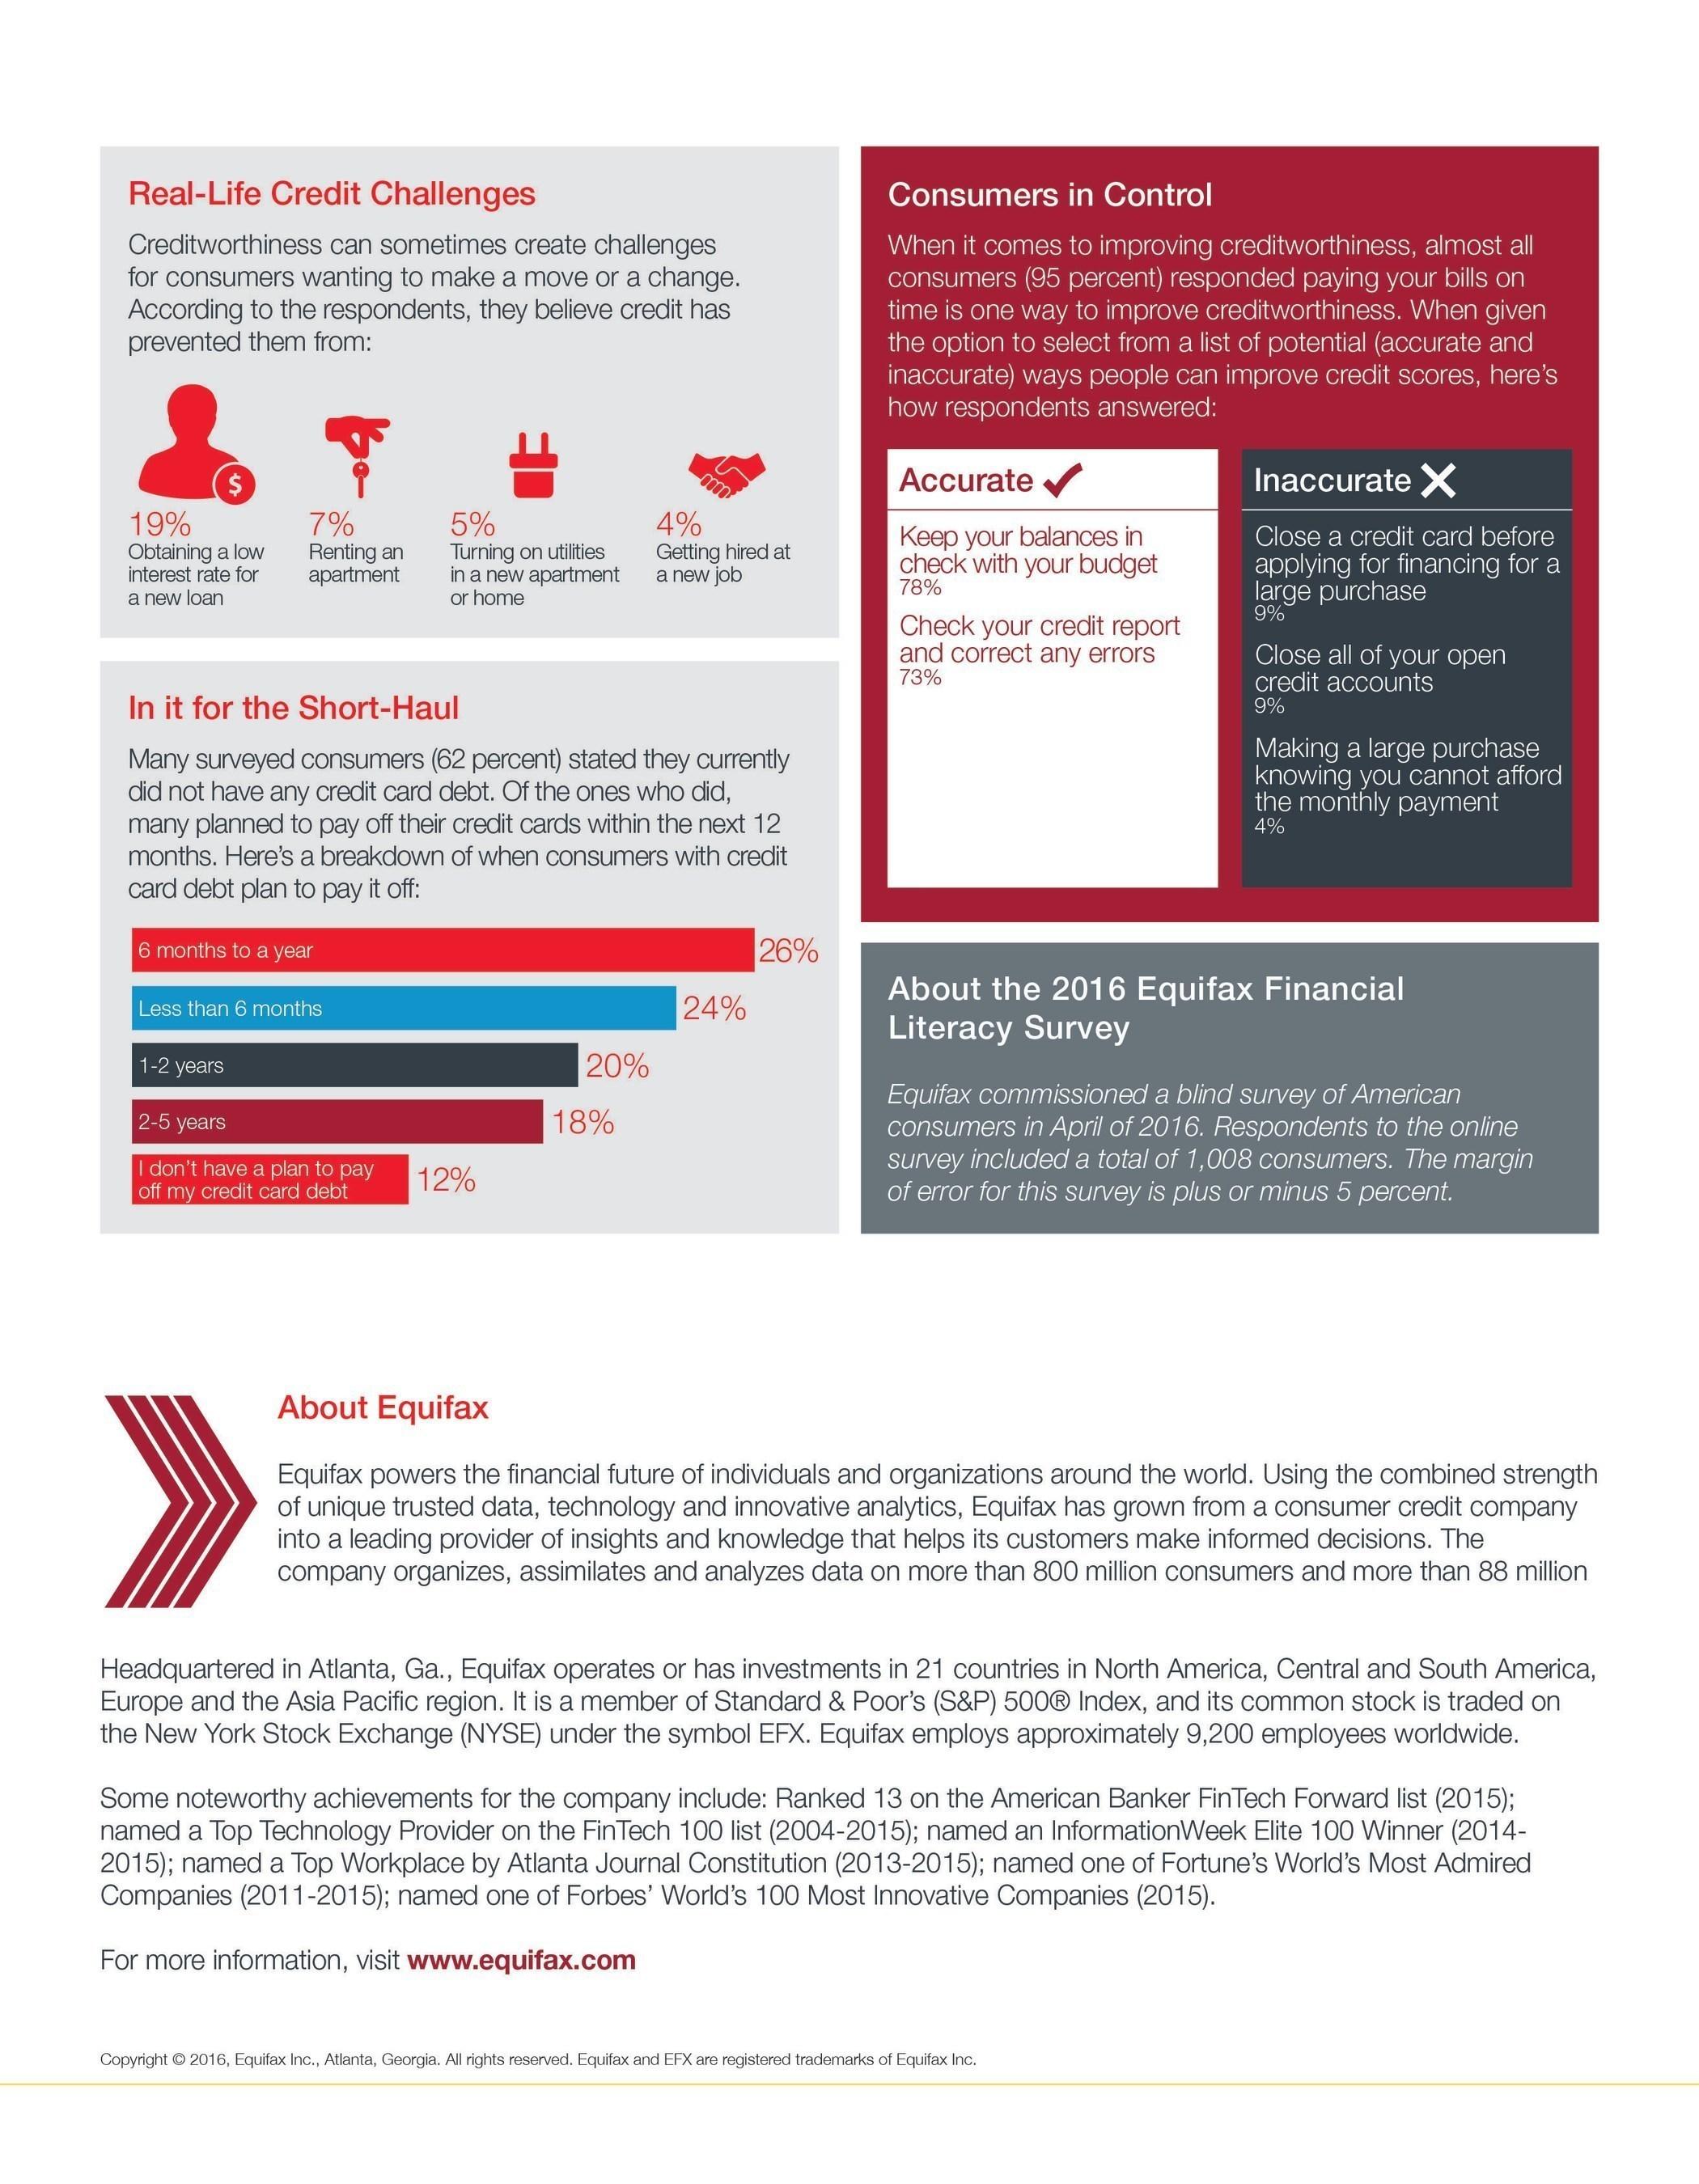 2016 Equifax Financial Literacy Survey